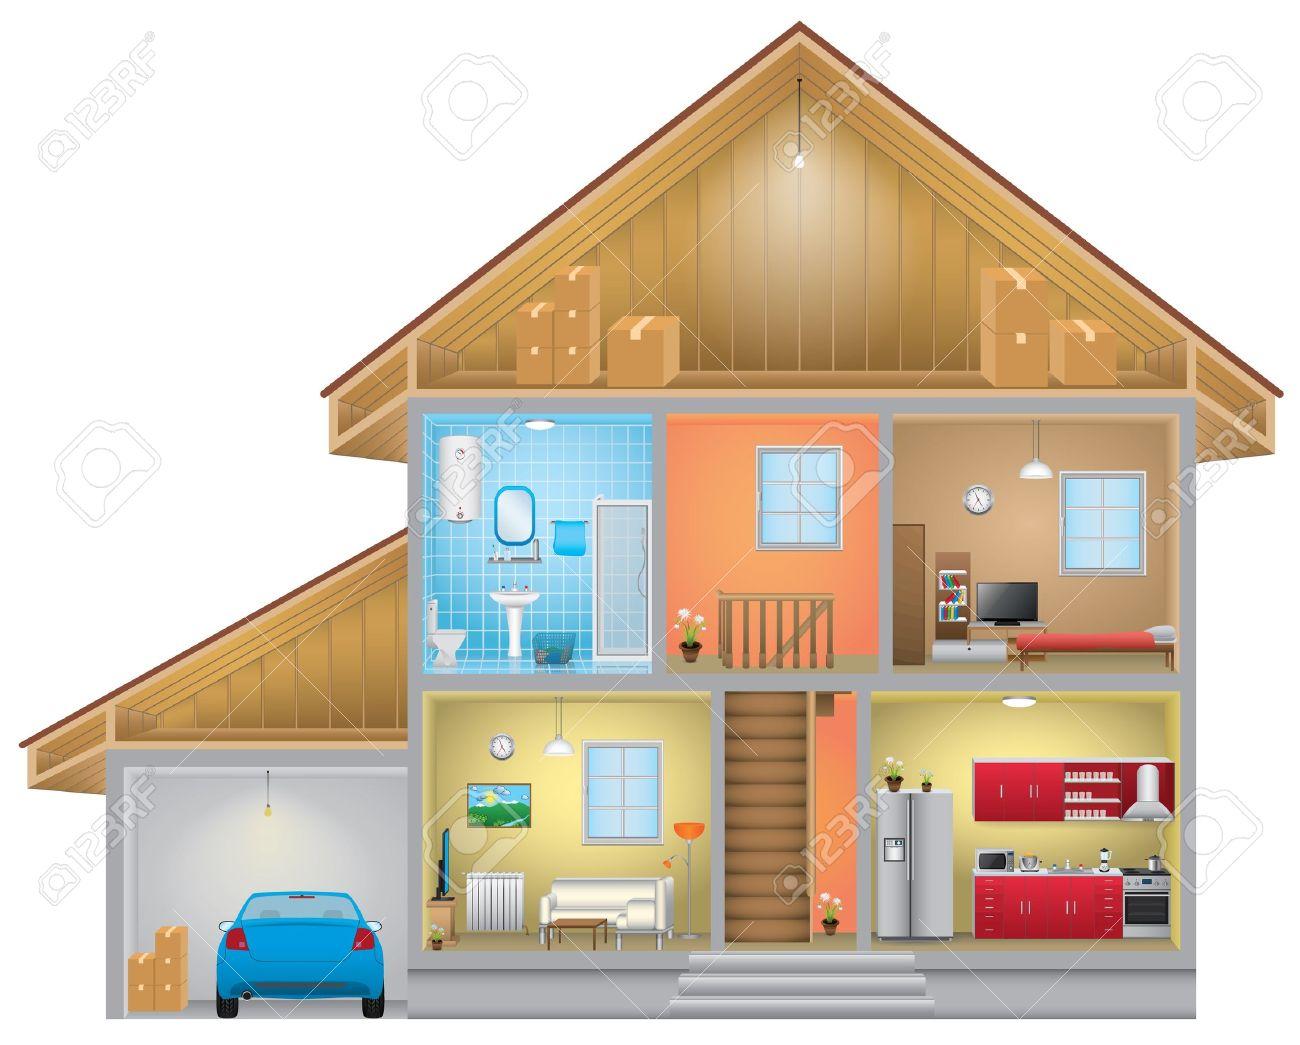 Great Casa Interior Imagens   21736191 Part 24